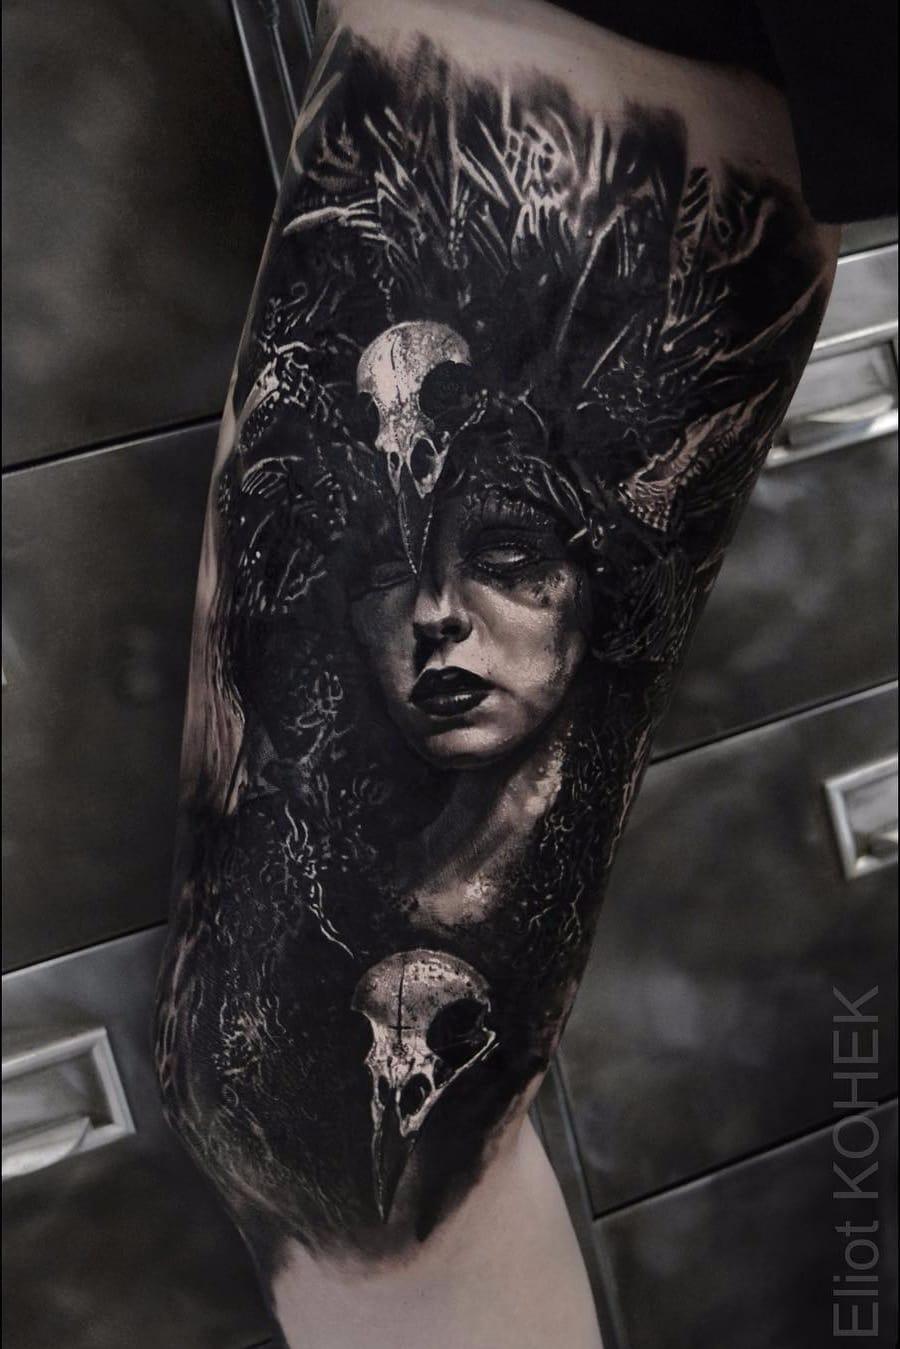 Por Eliot Kohek #EliotKohek #gringo #realismo #realism #pretoecinza #blackandgrey #woman #mulher #skull #caveira #dark #terror #horror #bruxa #witch #bruxaria #witchcraft